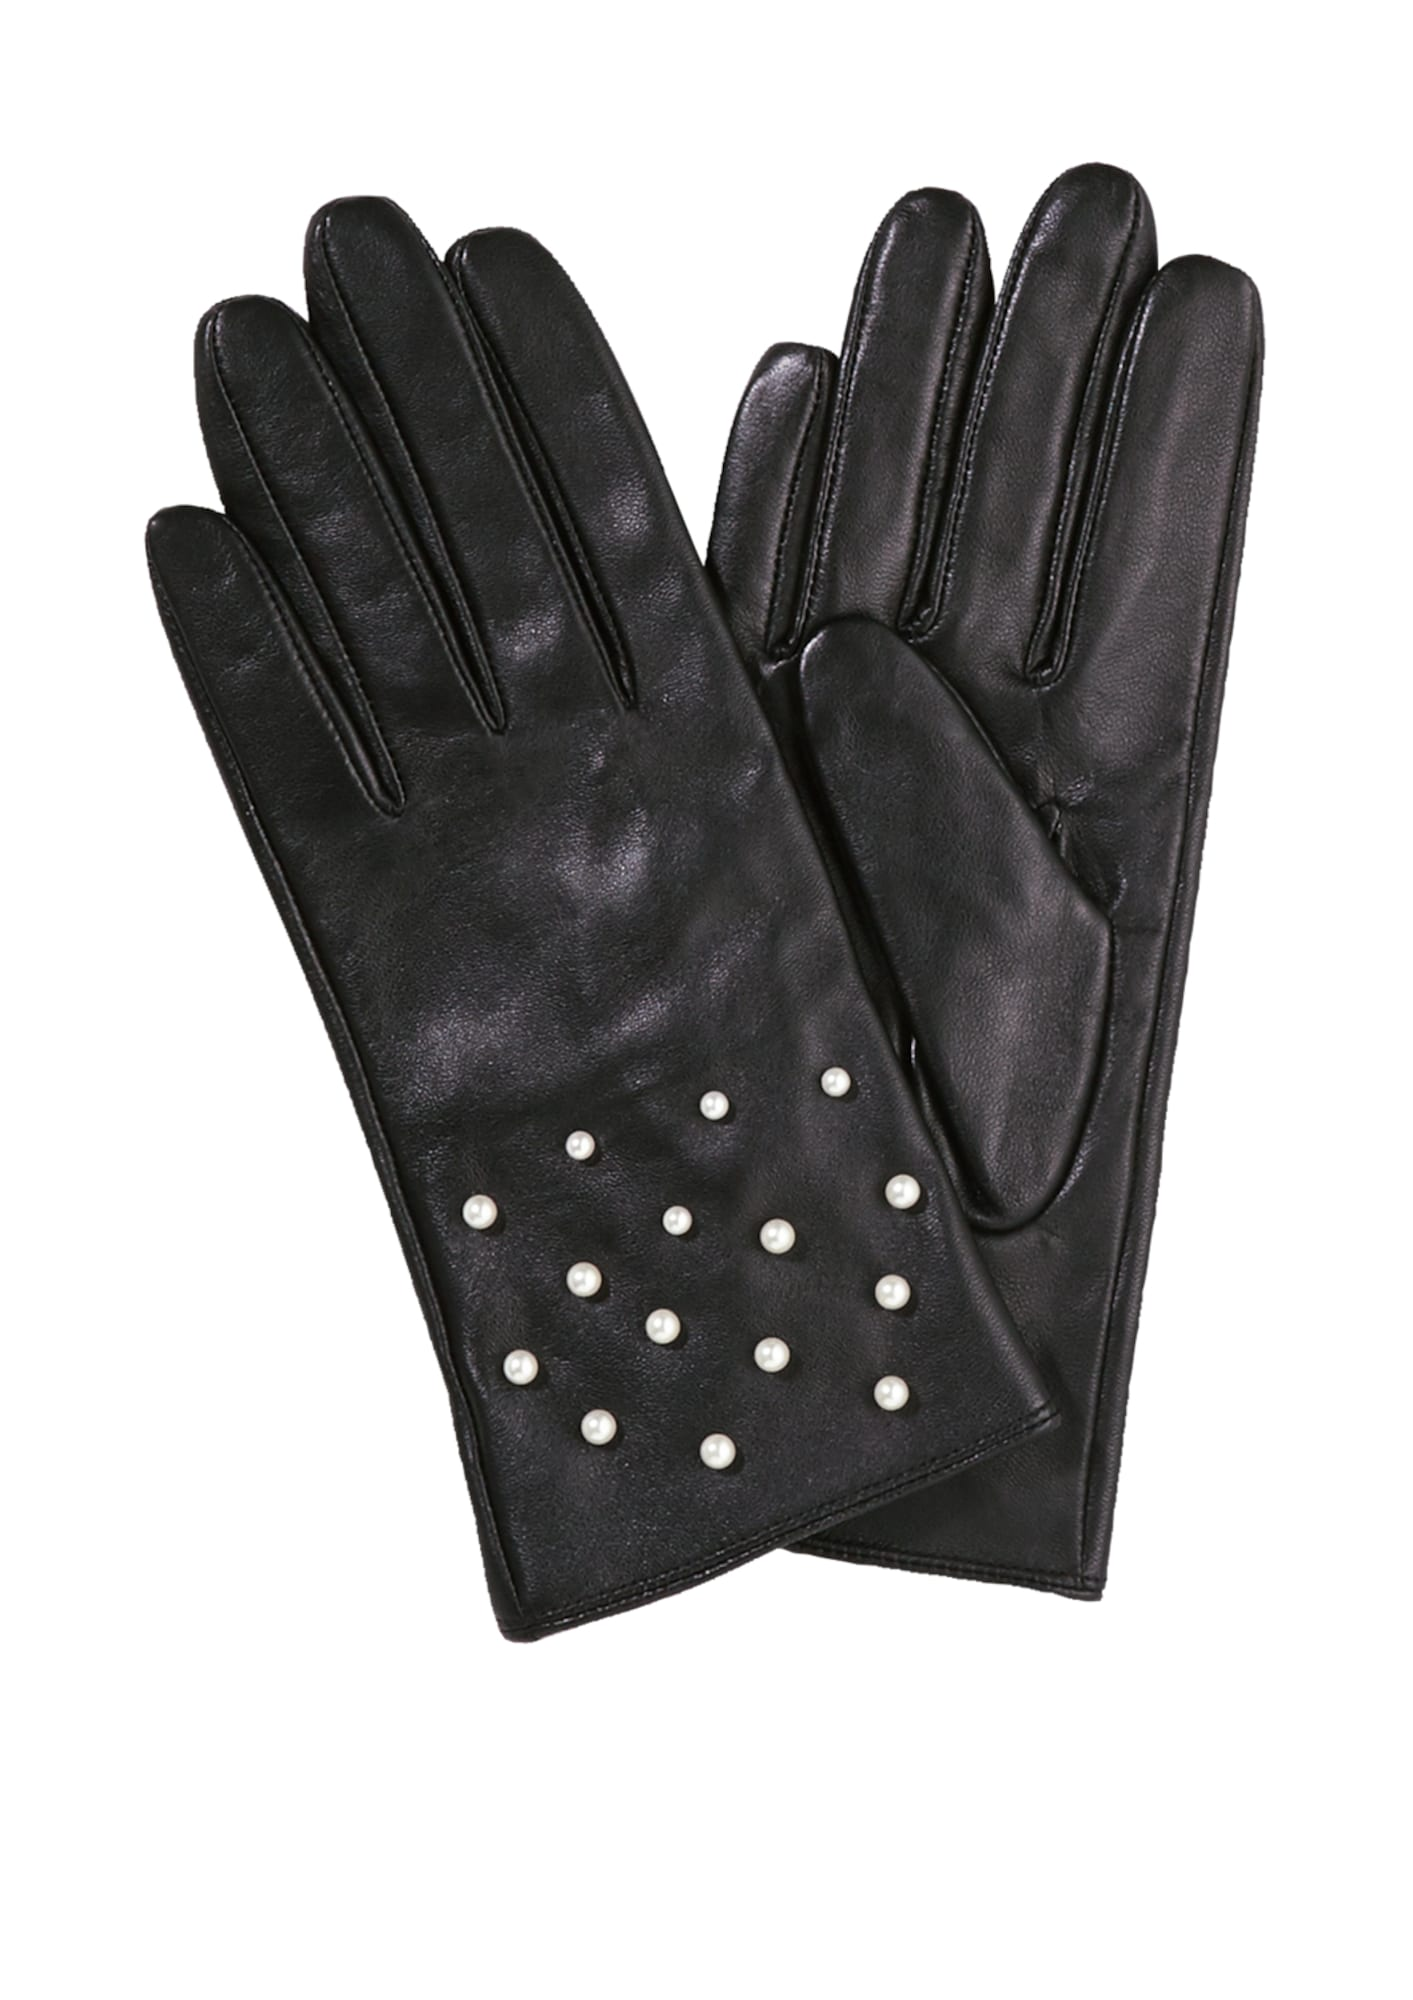 Lederhandschuhe | Accessoires > Handschuhe > Lederhandschuhe | Schwarz | S.Oliver BLACK LABEL